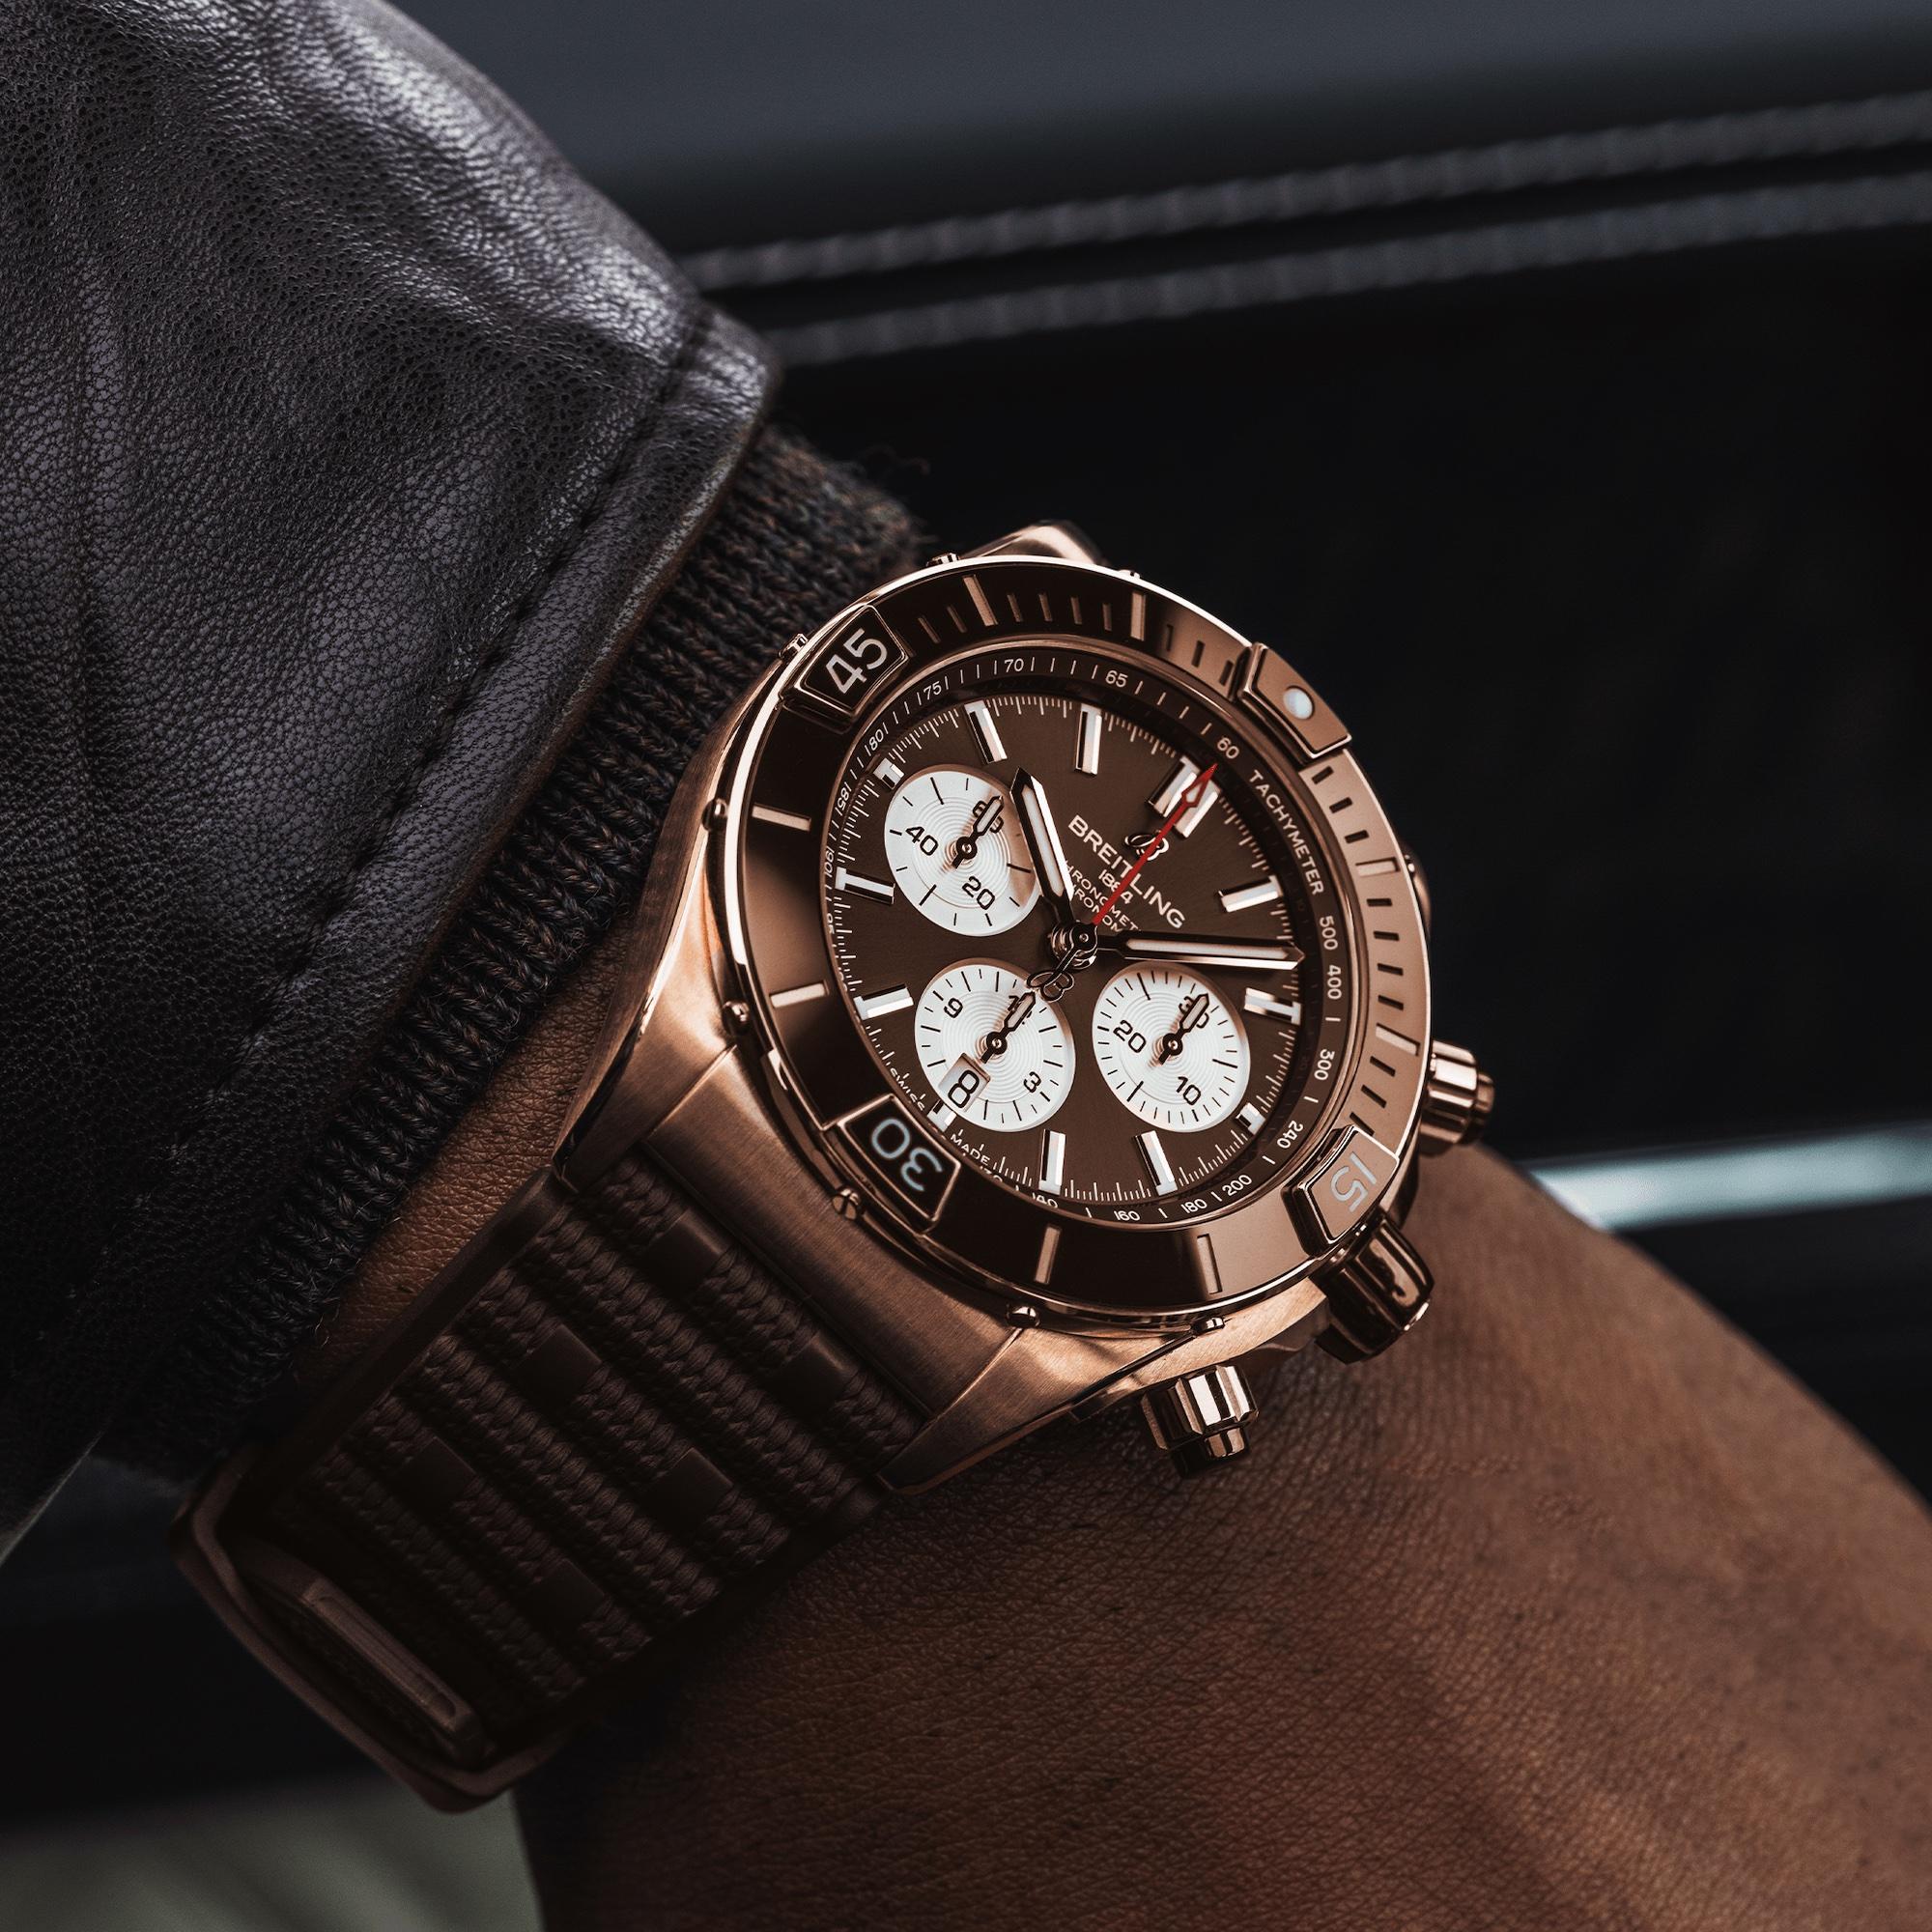 Breitling Super Chronomat B01 44 RB0136E31Q1S1 Lifestyle wristshot